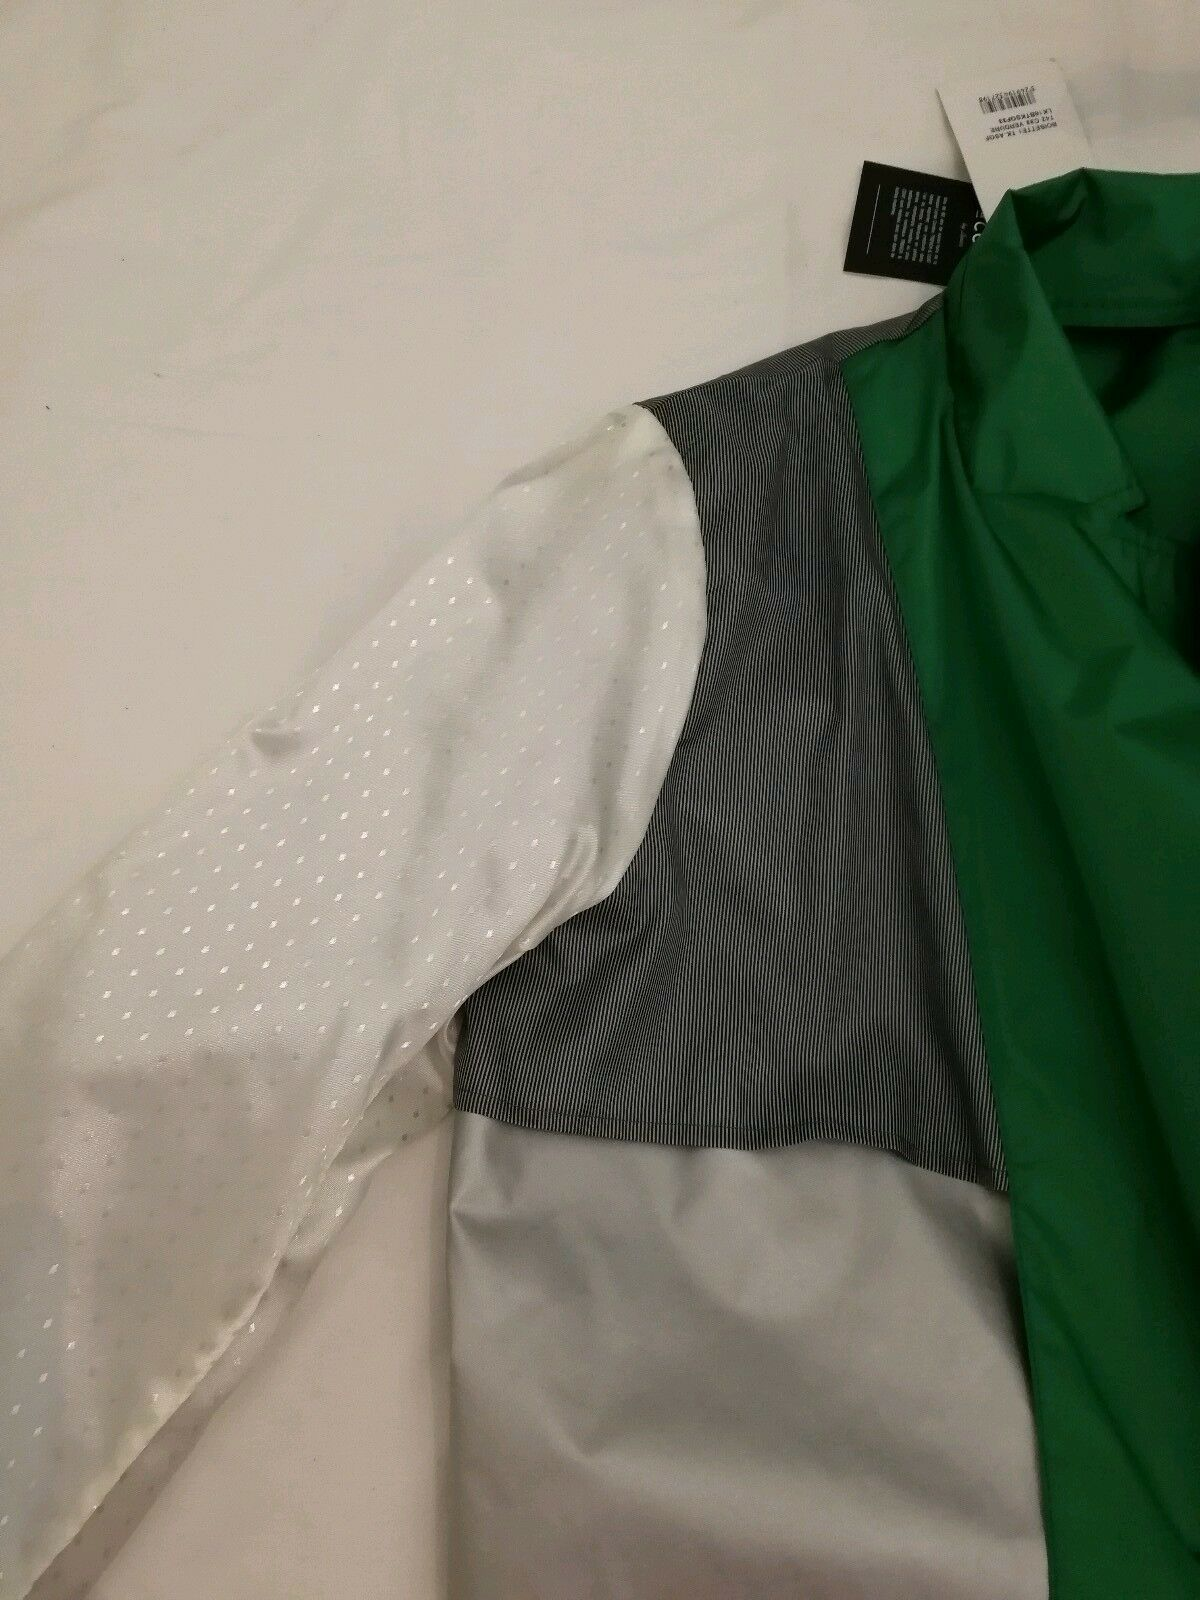 Trench & Coat Coat Coat BOISETTE By LENER Coated Fabric Water Repellant Coat Green Size uk 8a5126